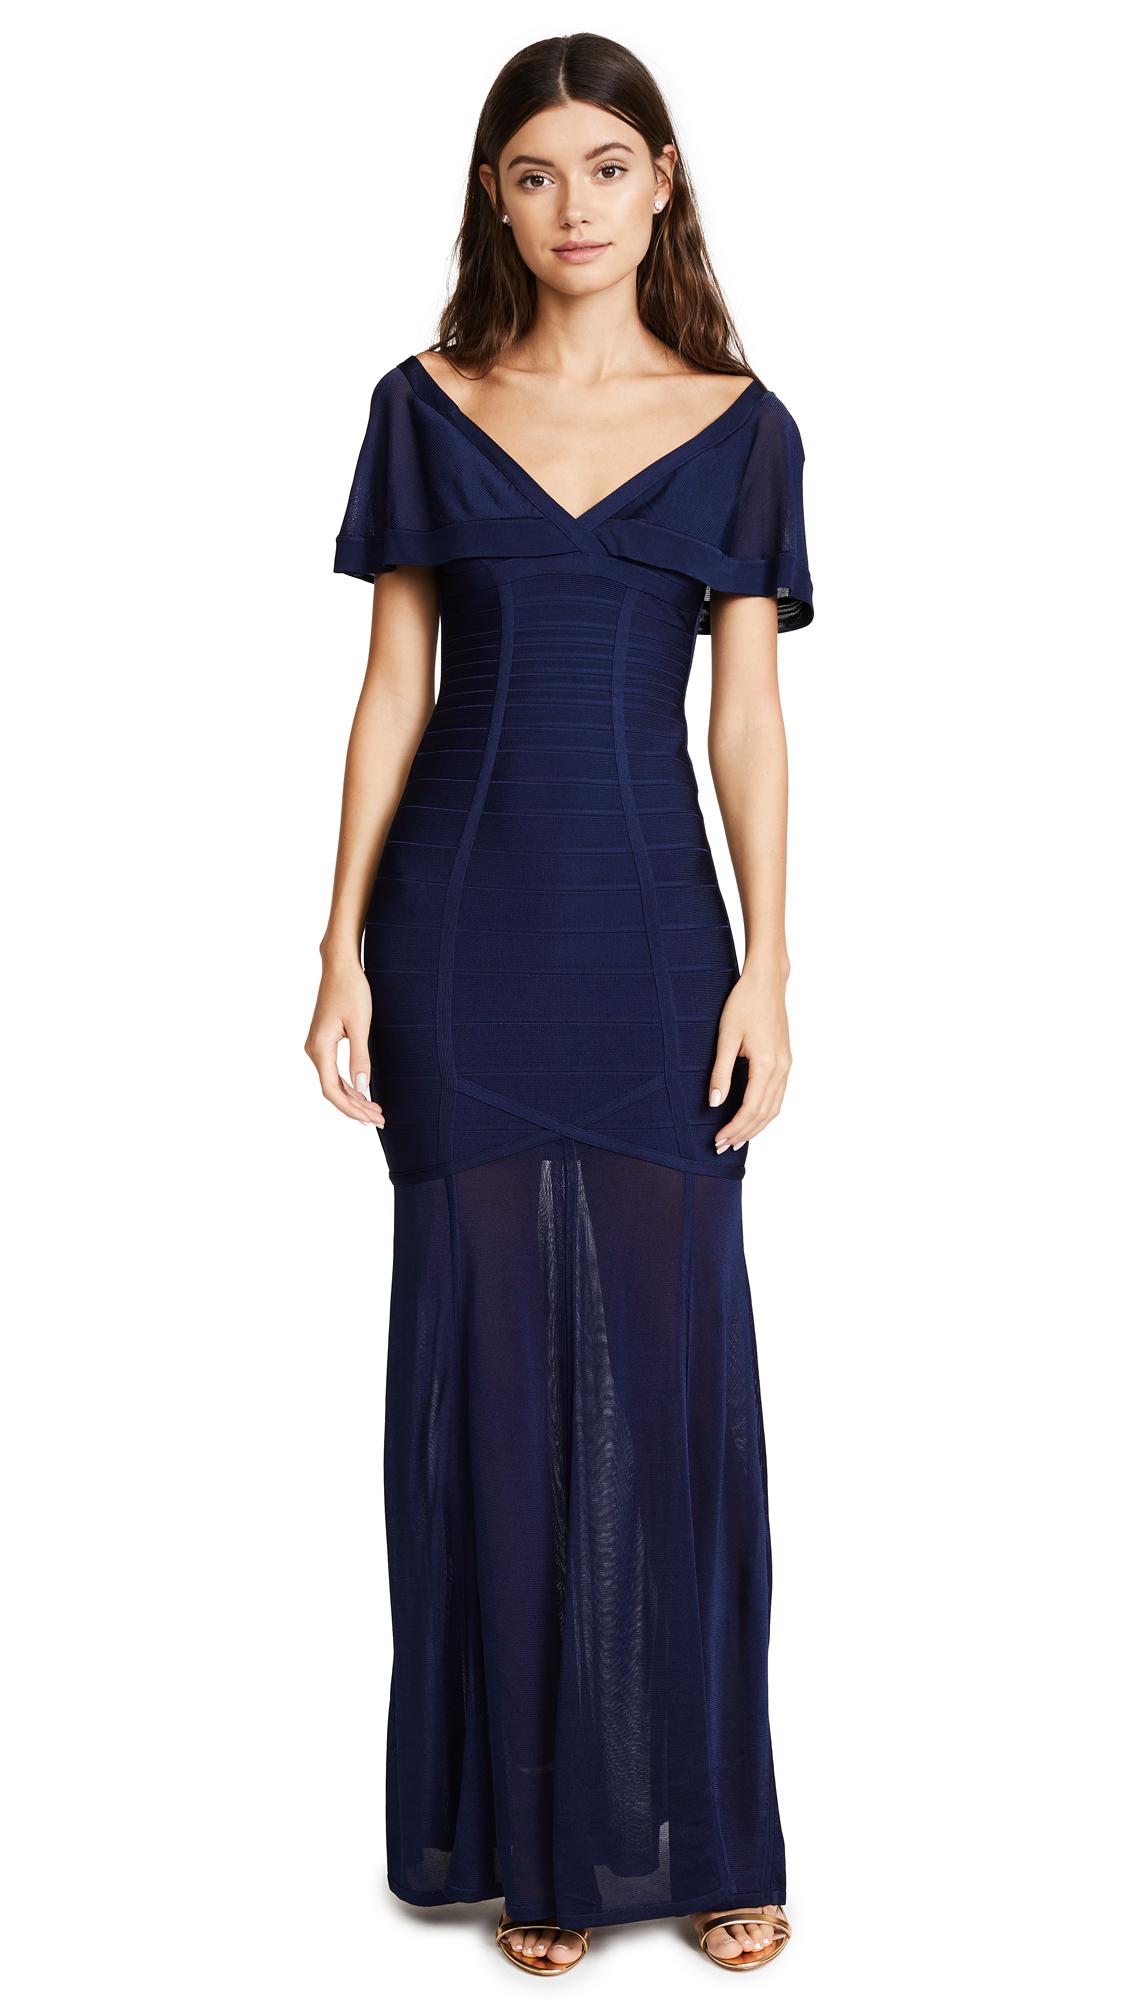 Herve Leger Caitlin Dress - Classic Blue